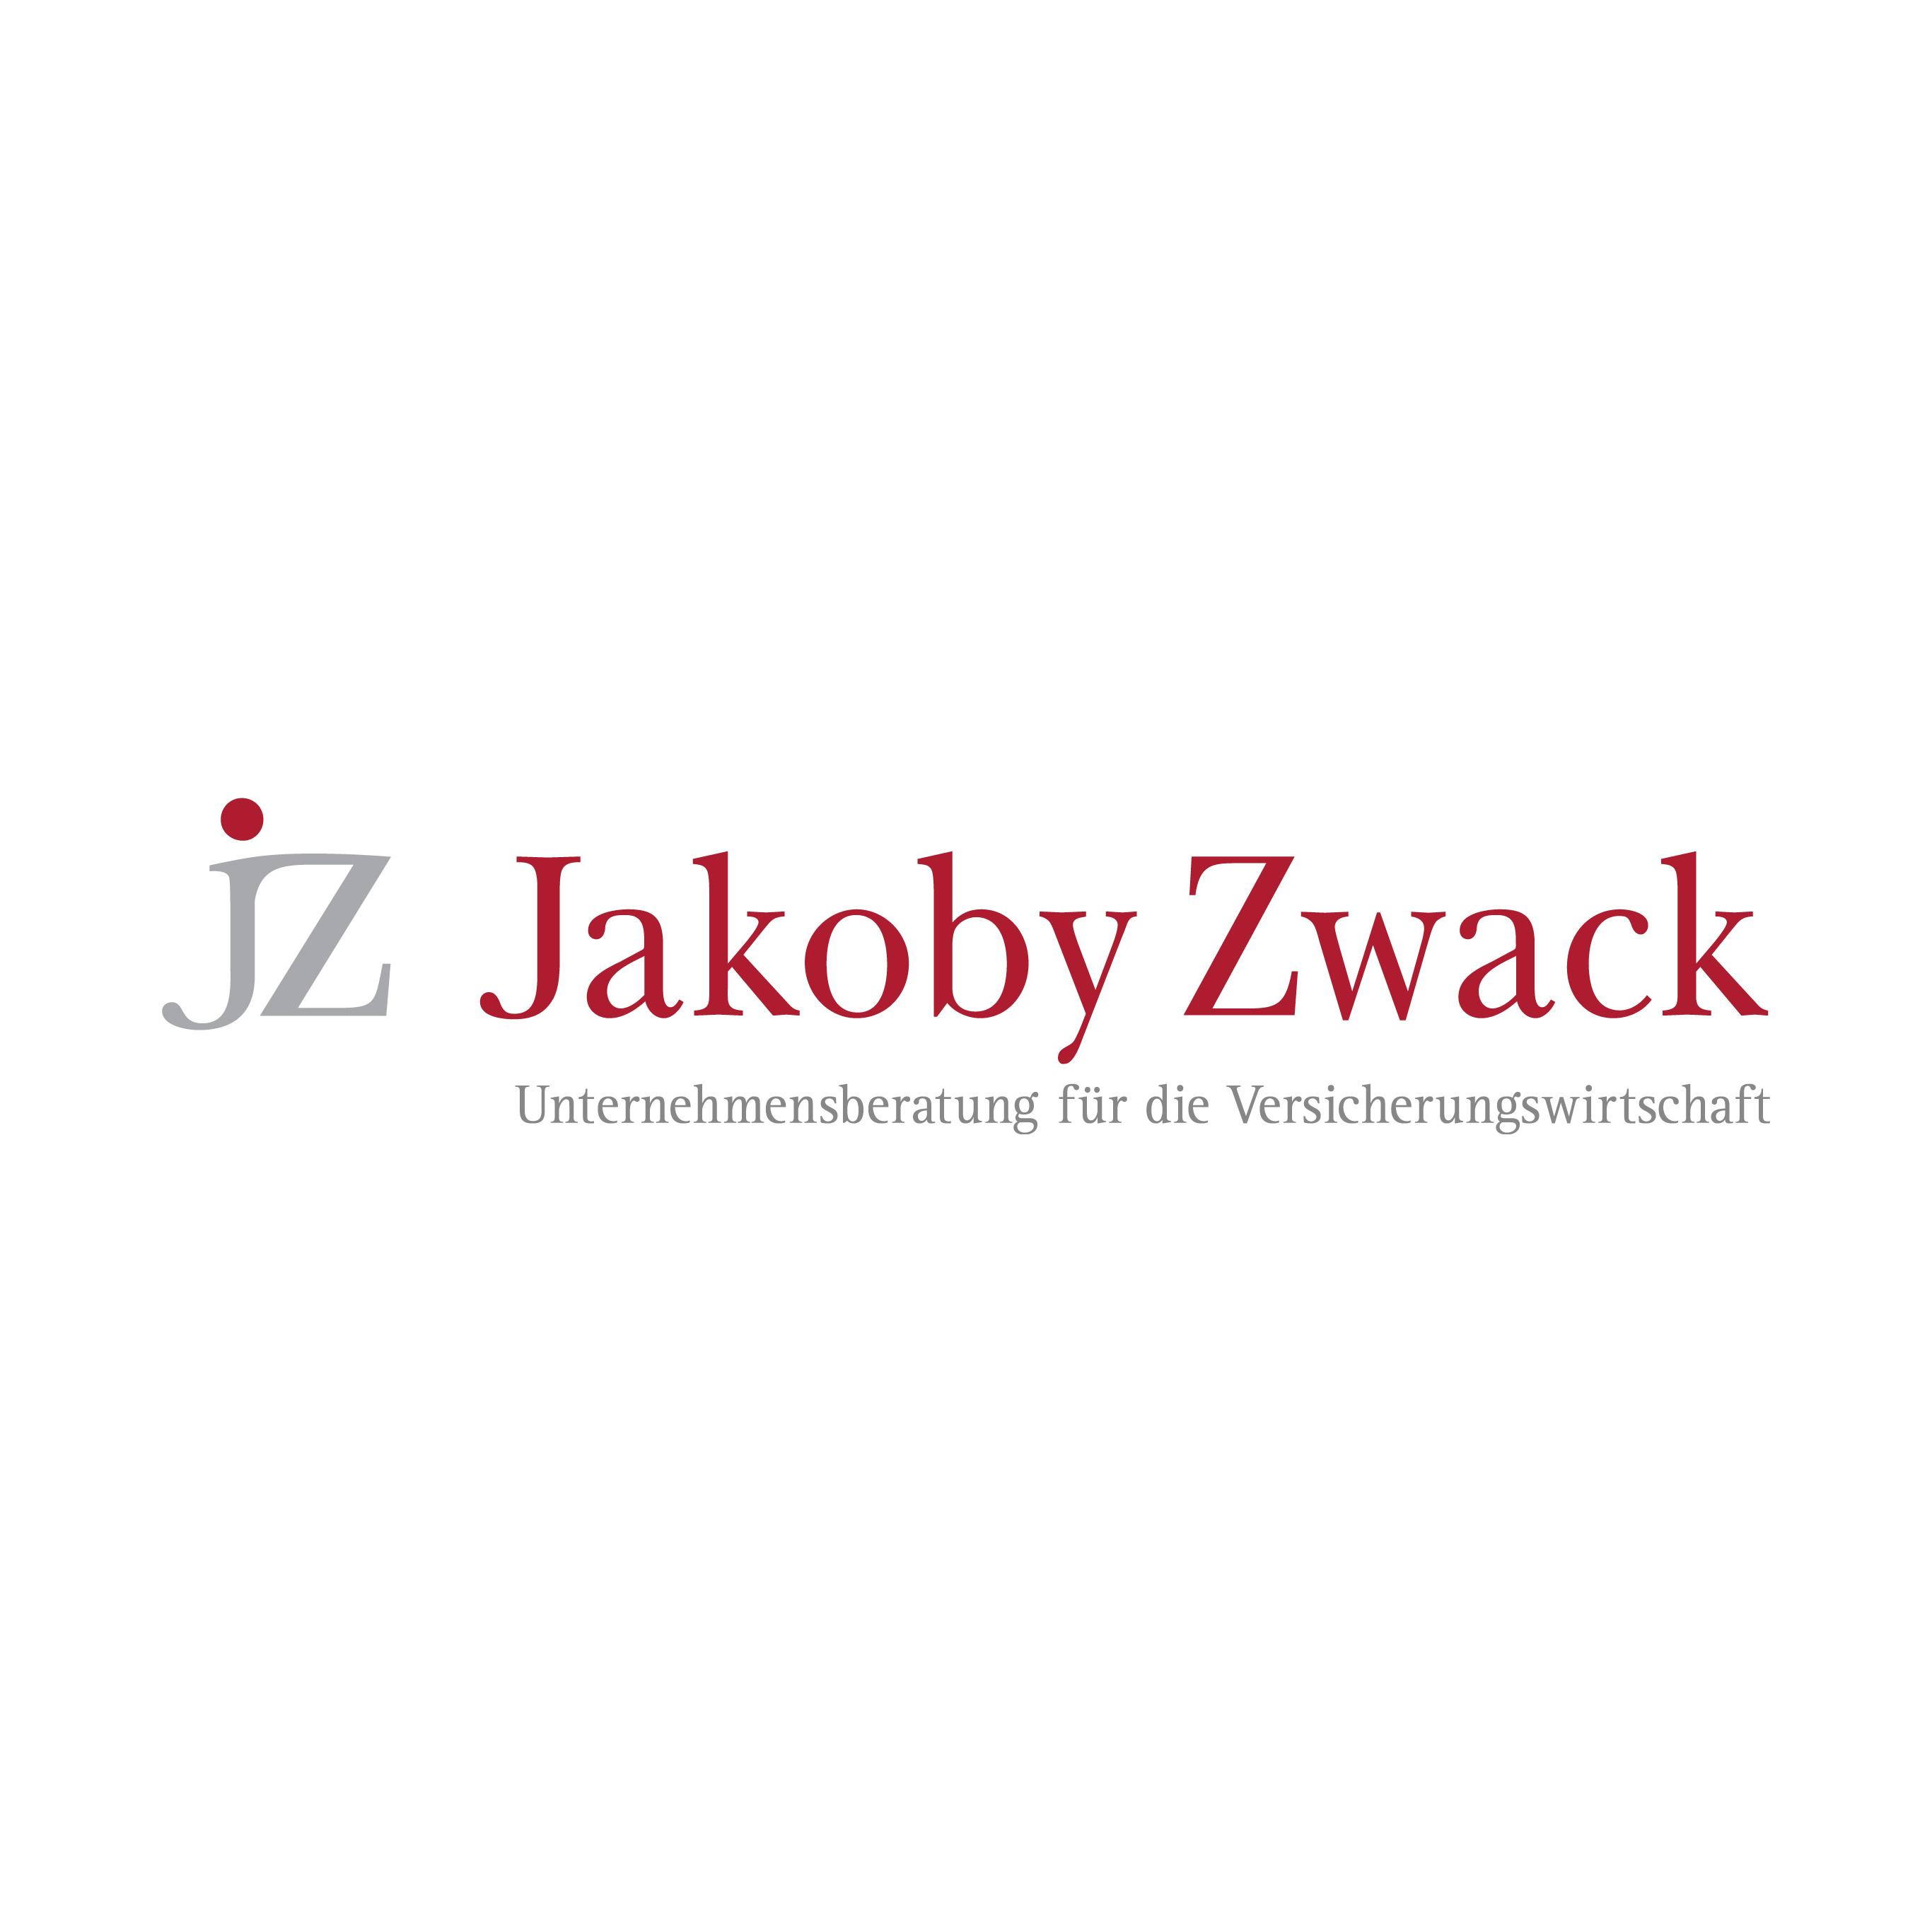 Jakoby Zwack.jpg